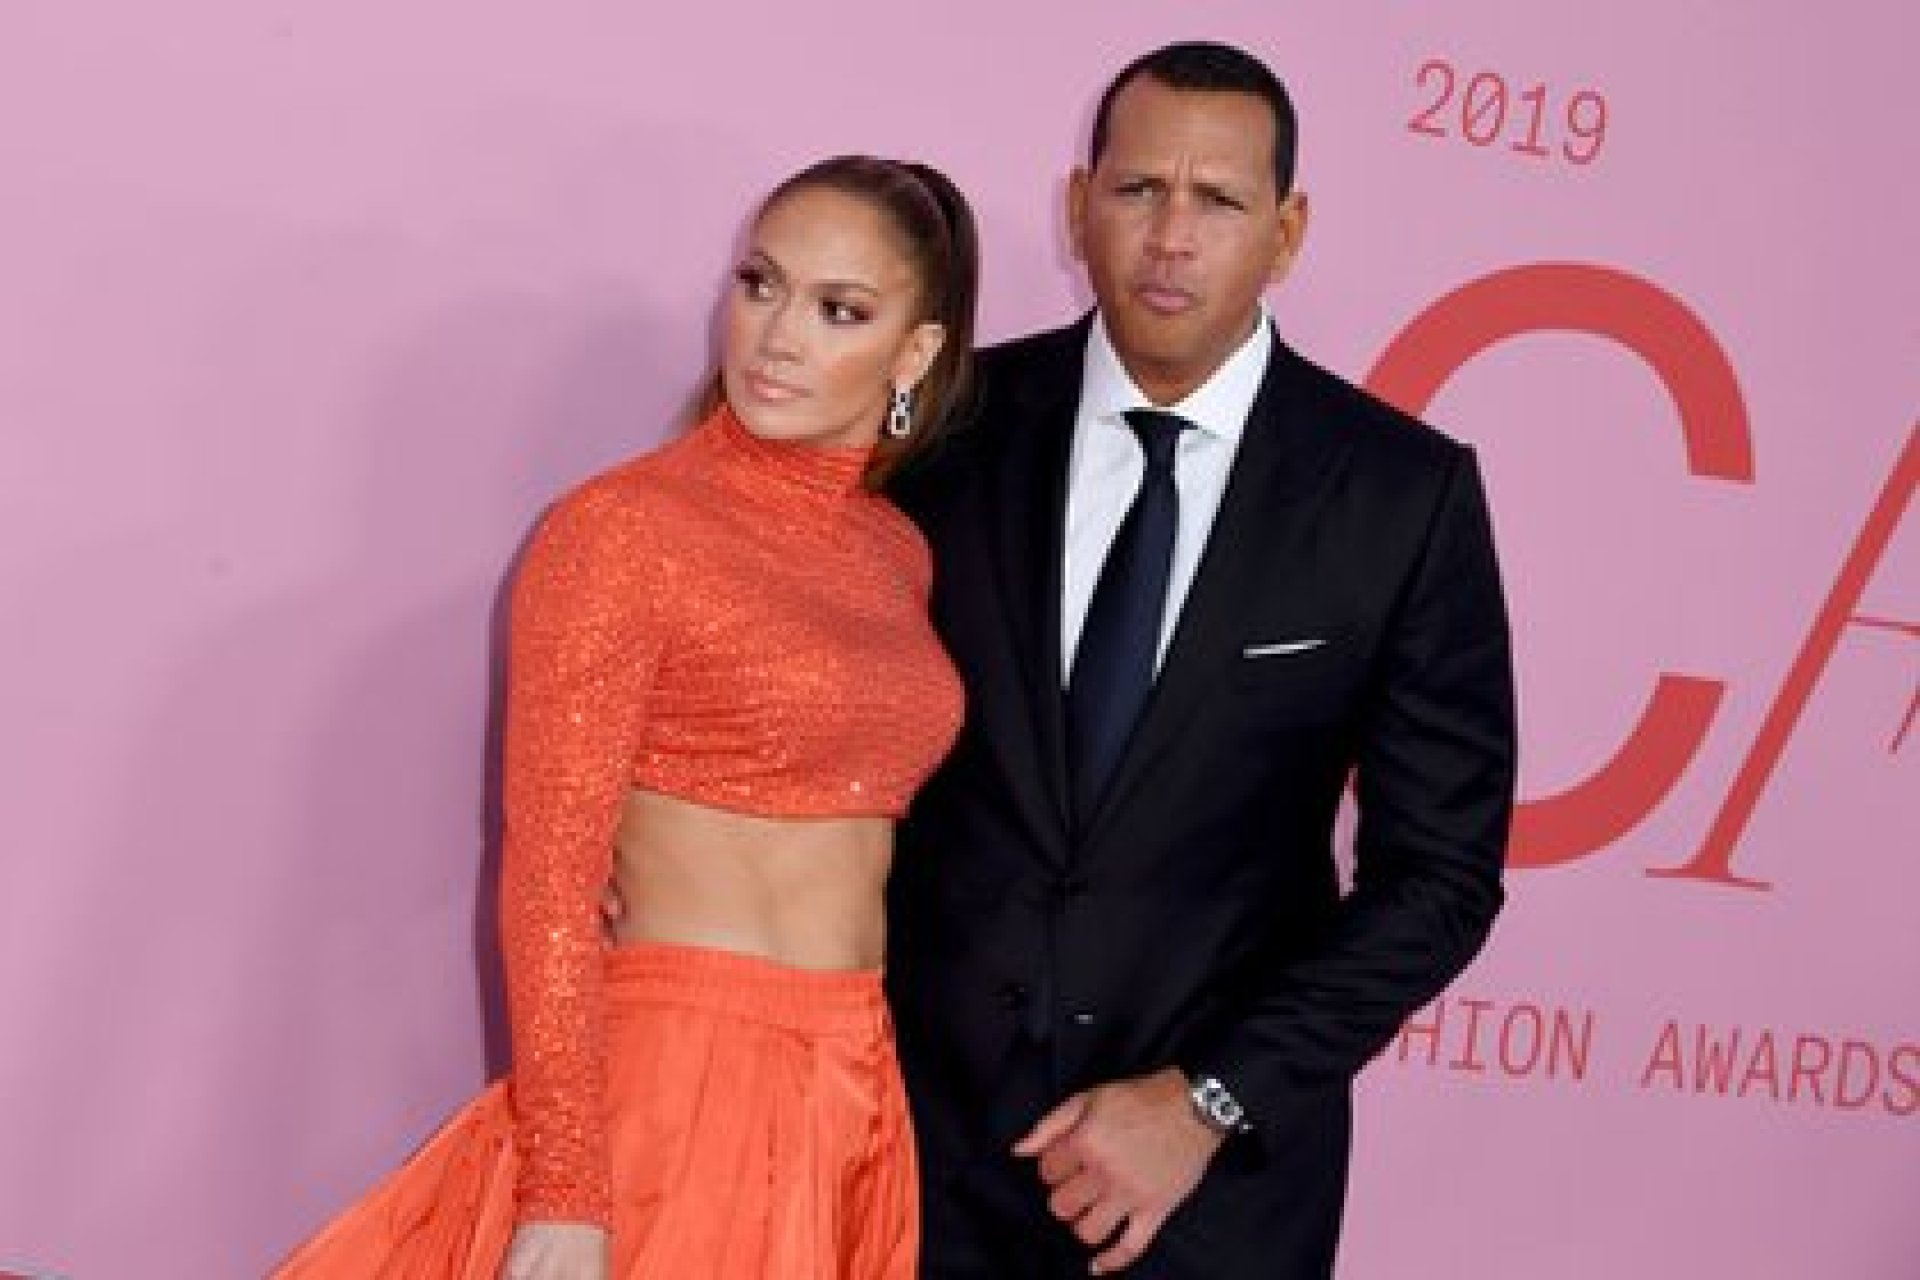 Jennifer Lopez y Alex Rodriguez tiene planes de casamiento (Shutterstock)